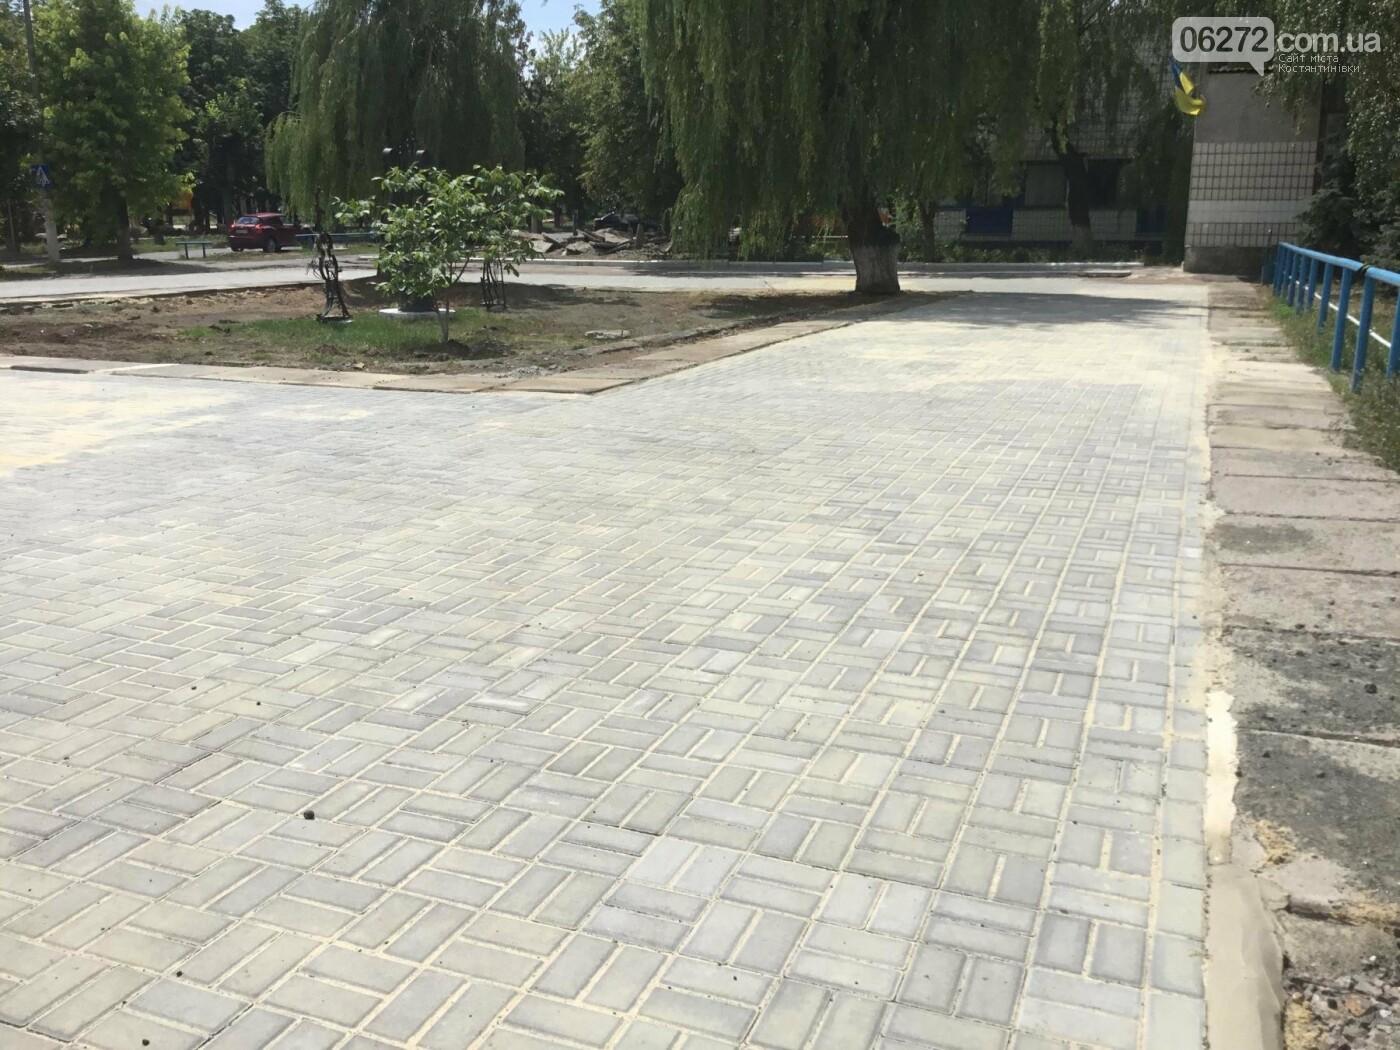 В Константиновке продолжают ремонт дорог, фото-6